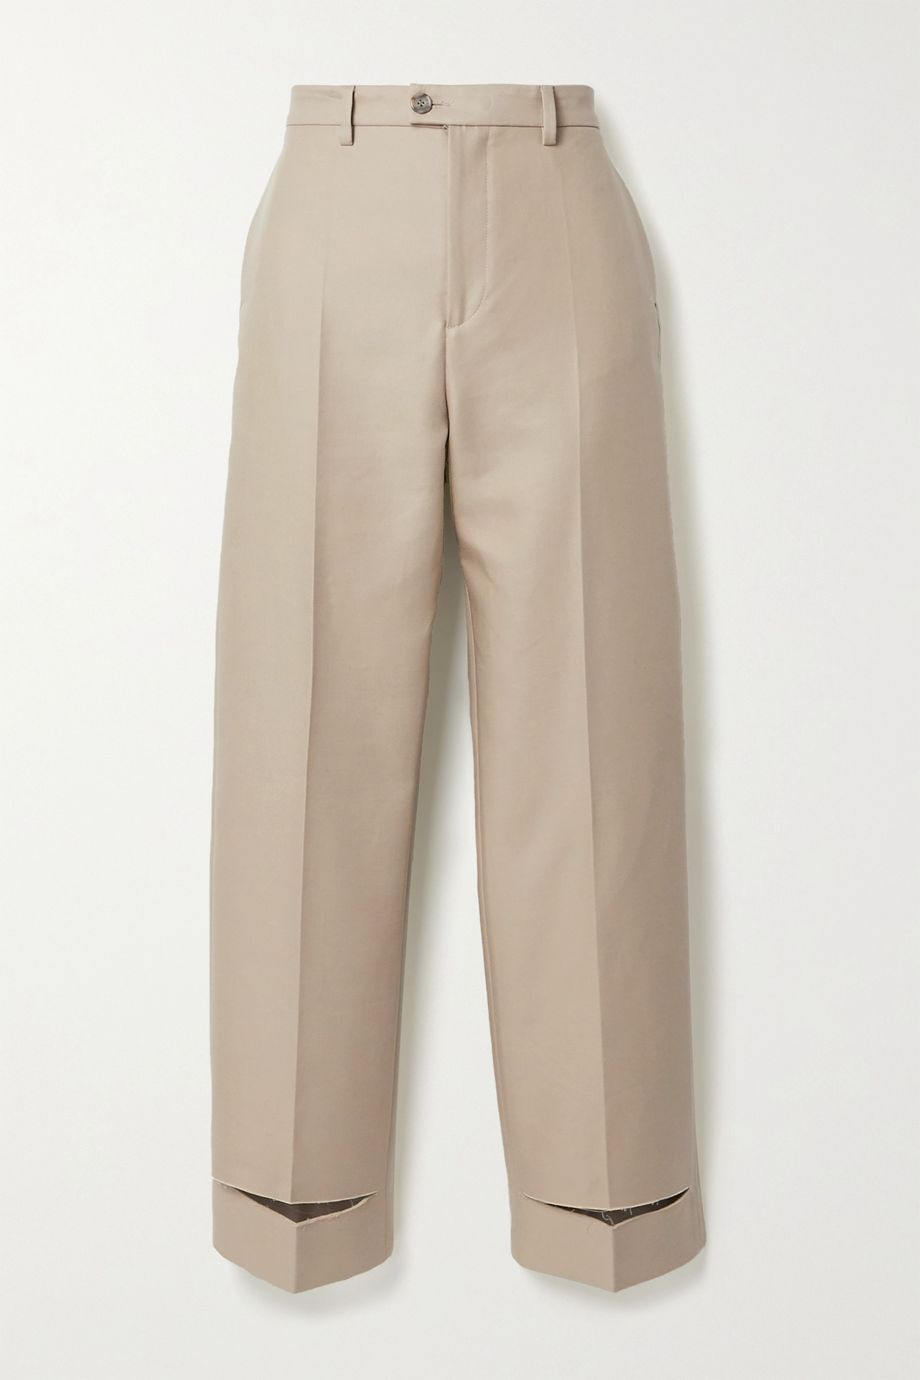 Maison Margiela 棉质混纺斜纹布直筒裤